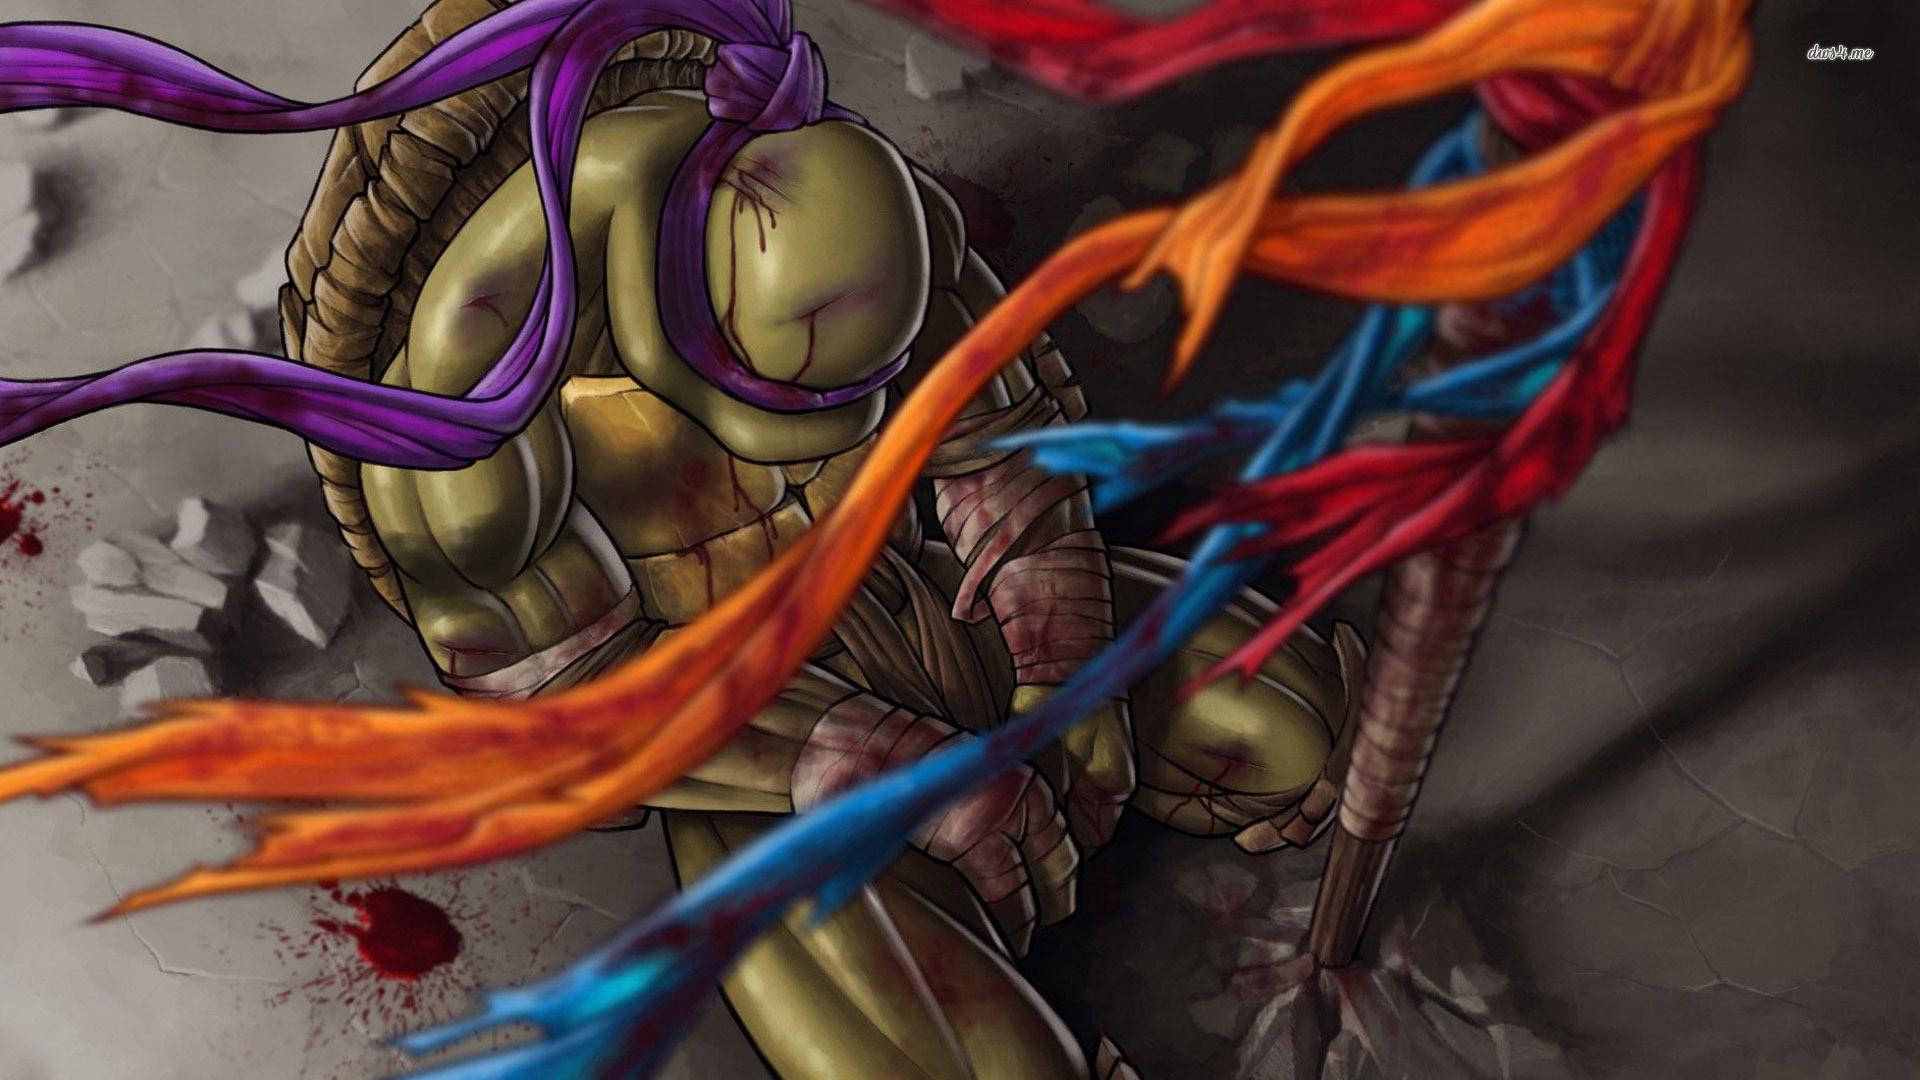 Res: 1920x1080, ... Donatello - Teenage Mutant Ninja Turtles wallpaper  ...